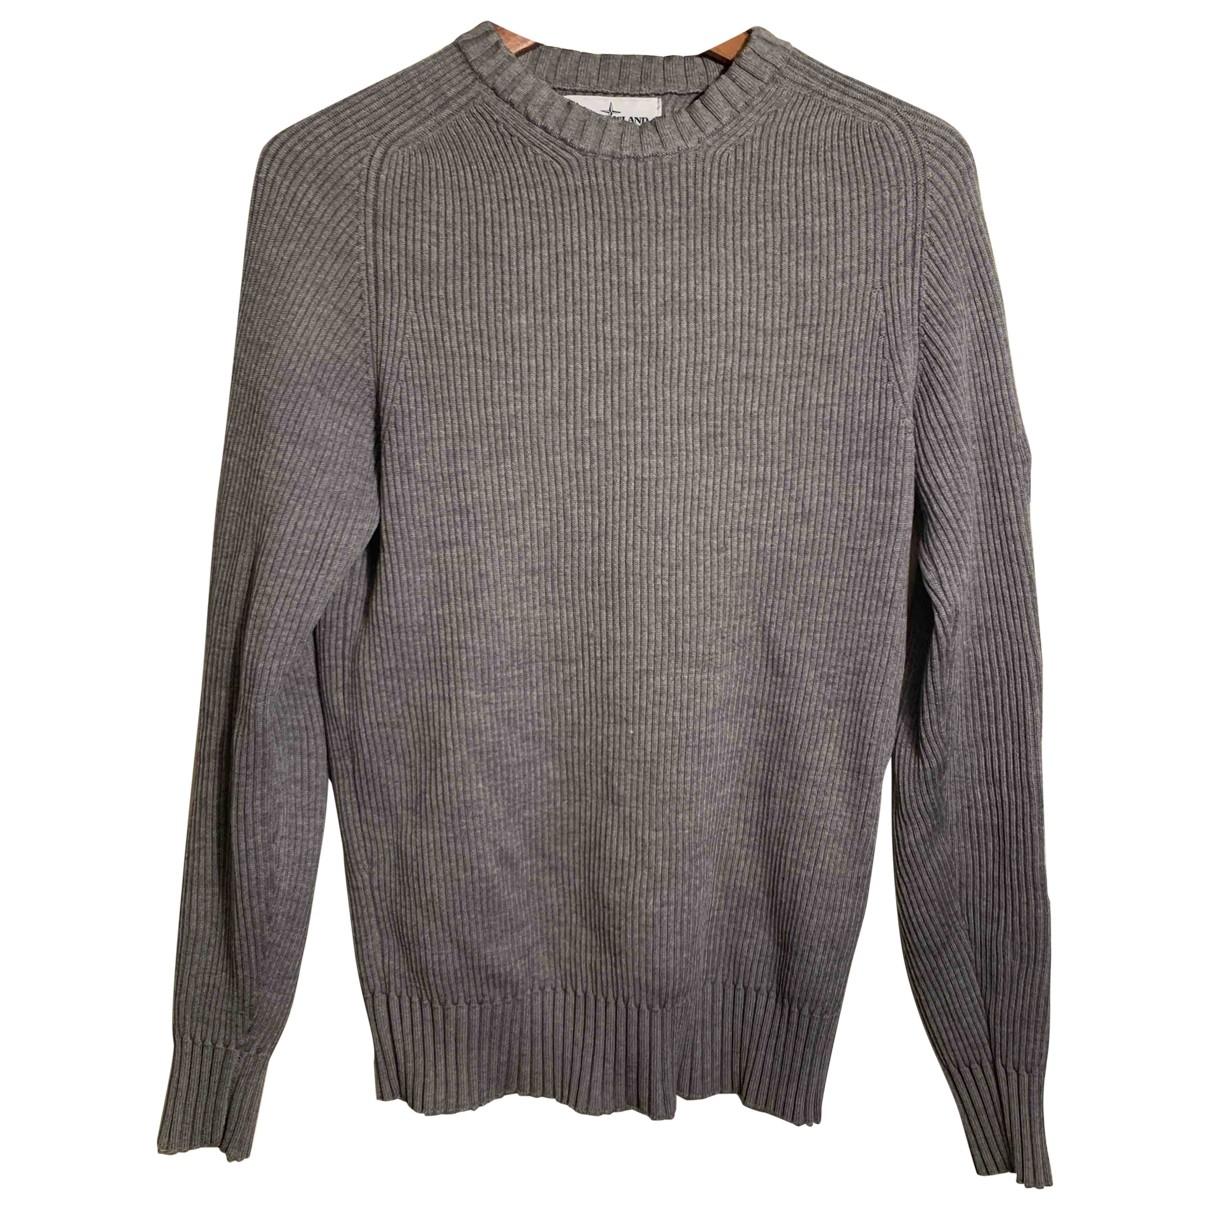 Stone Island \N Grey Wool Knitwear & Sweatshirts for Men M International